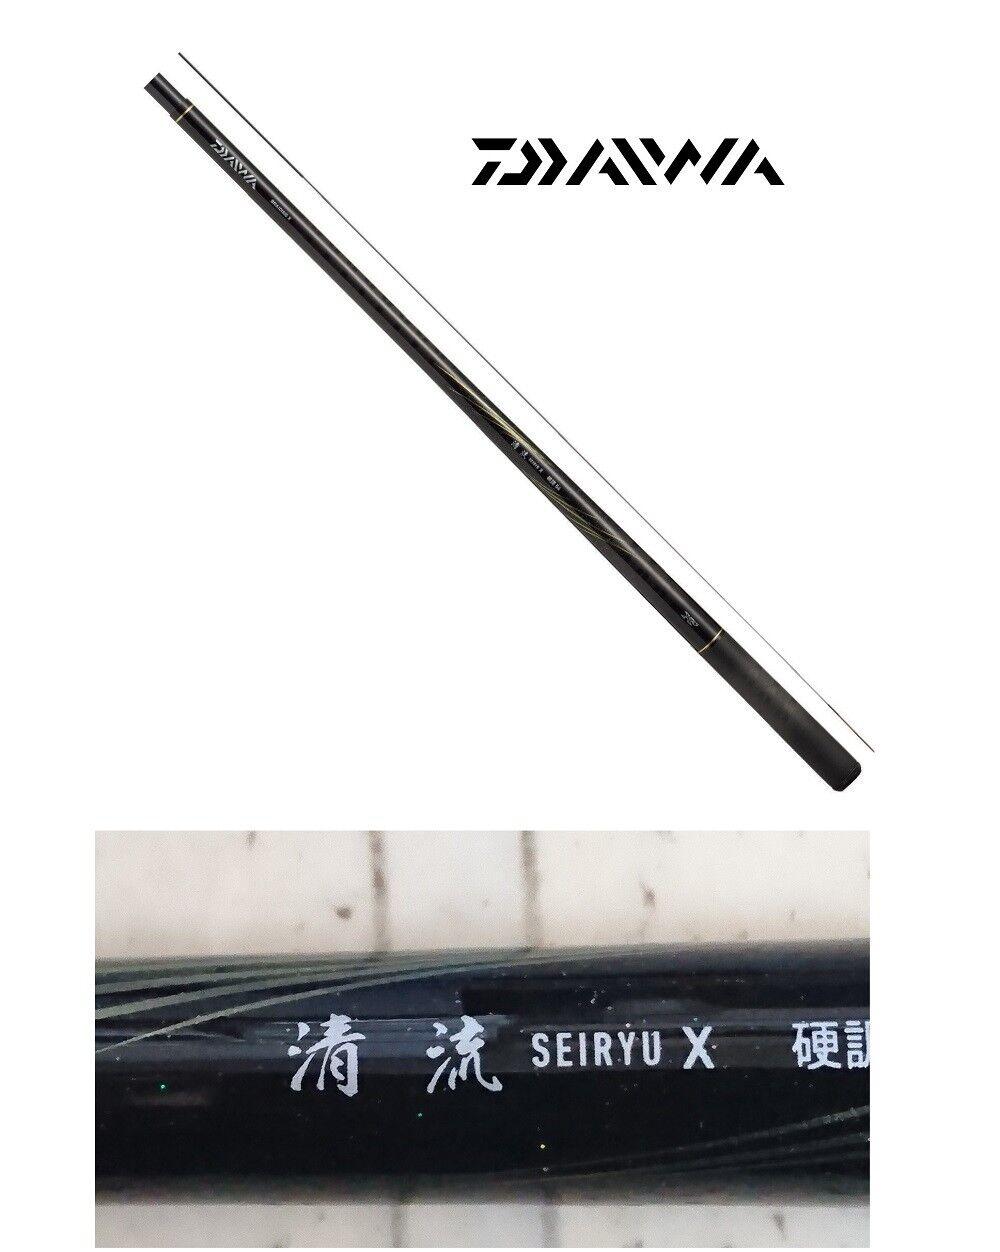 Daiwa Seiryu X koucho 45 Varilla Telescópica Pesca Polo Turismo Tenkara